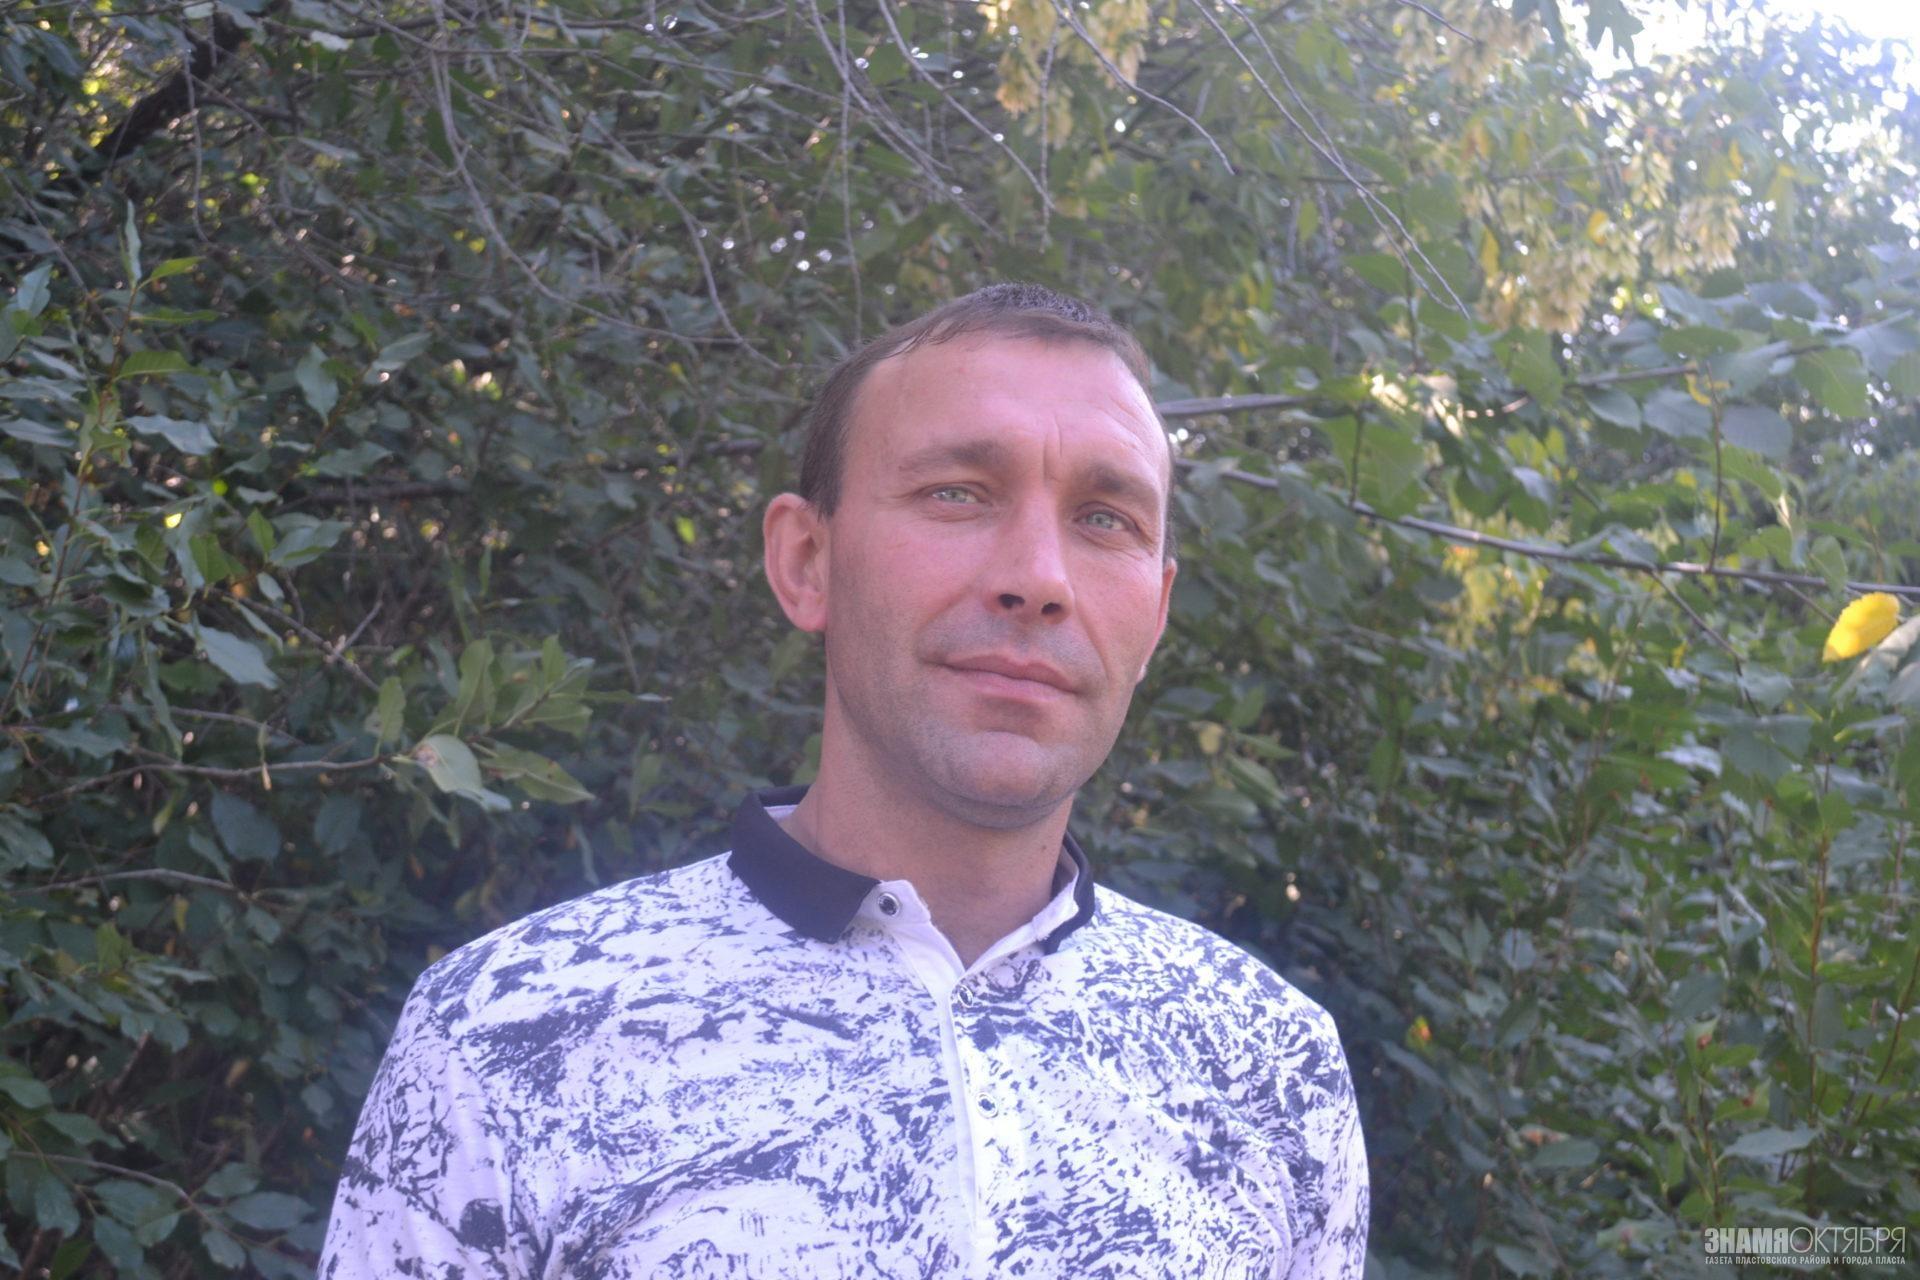 Семёрки проходчика Зайцева